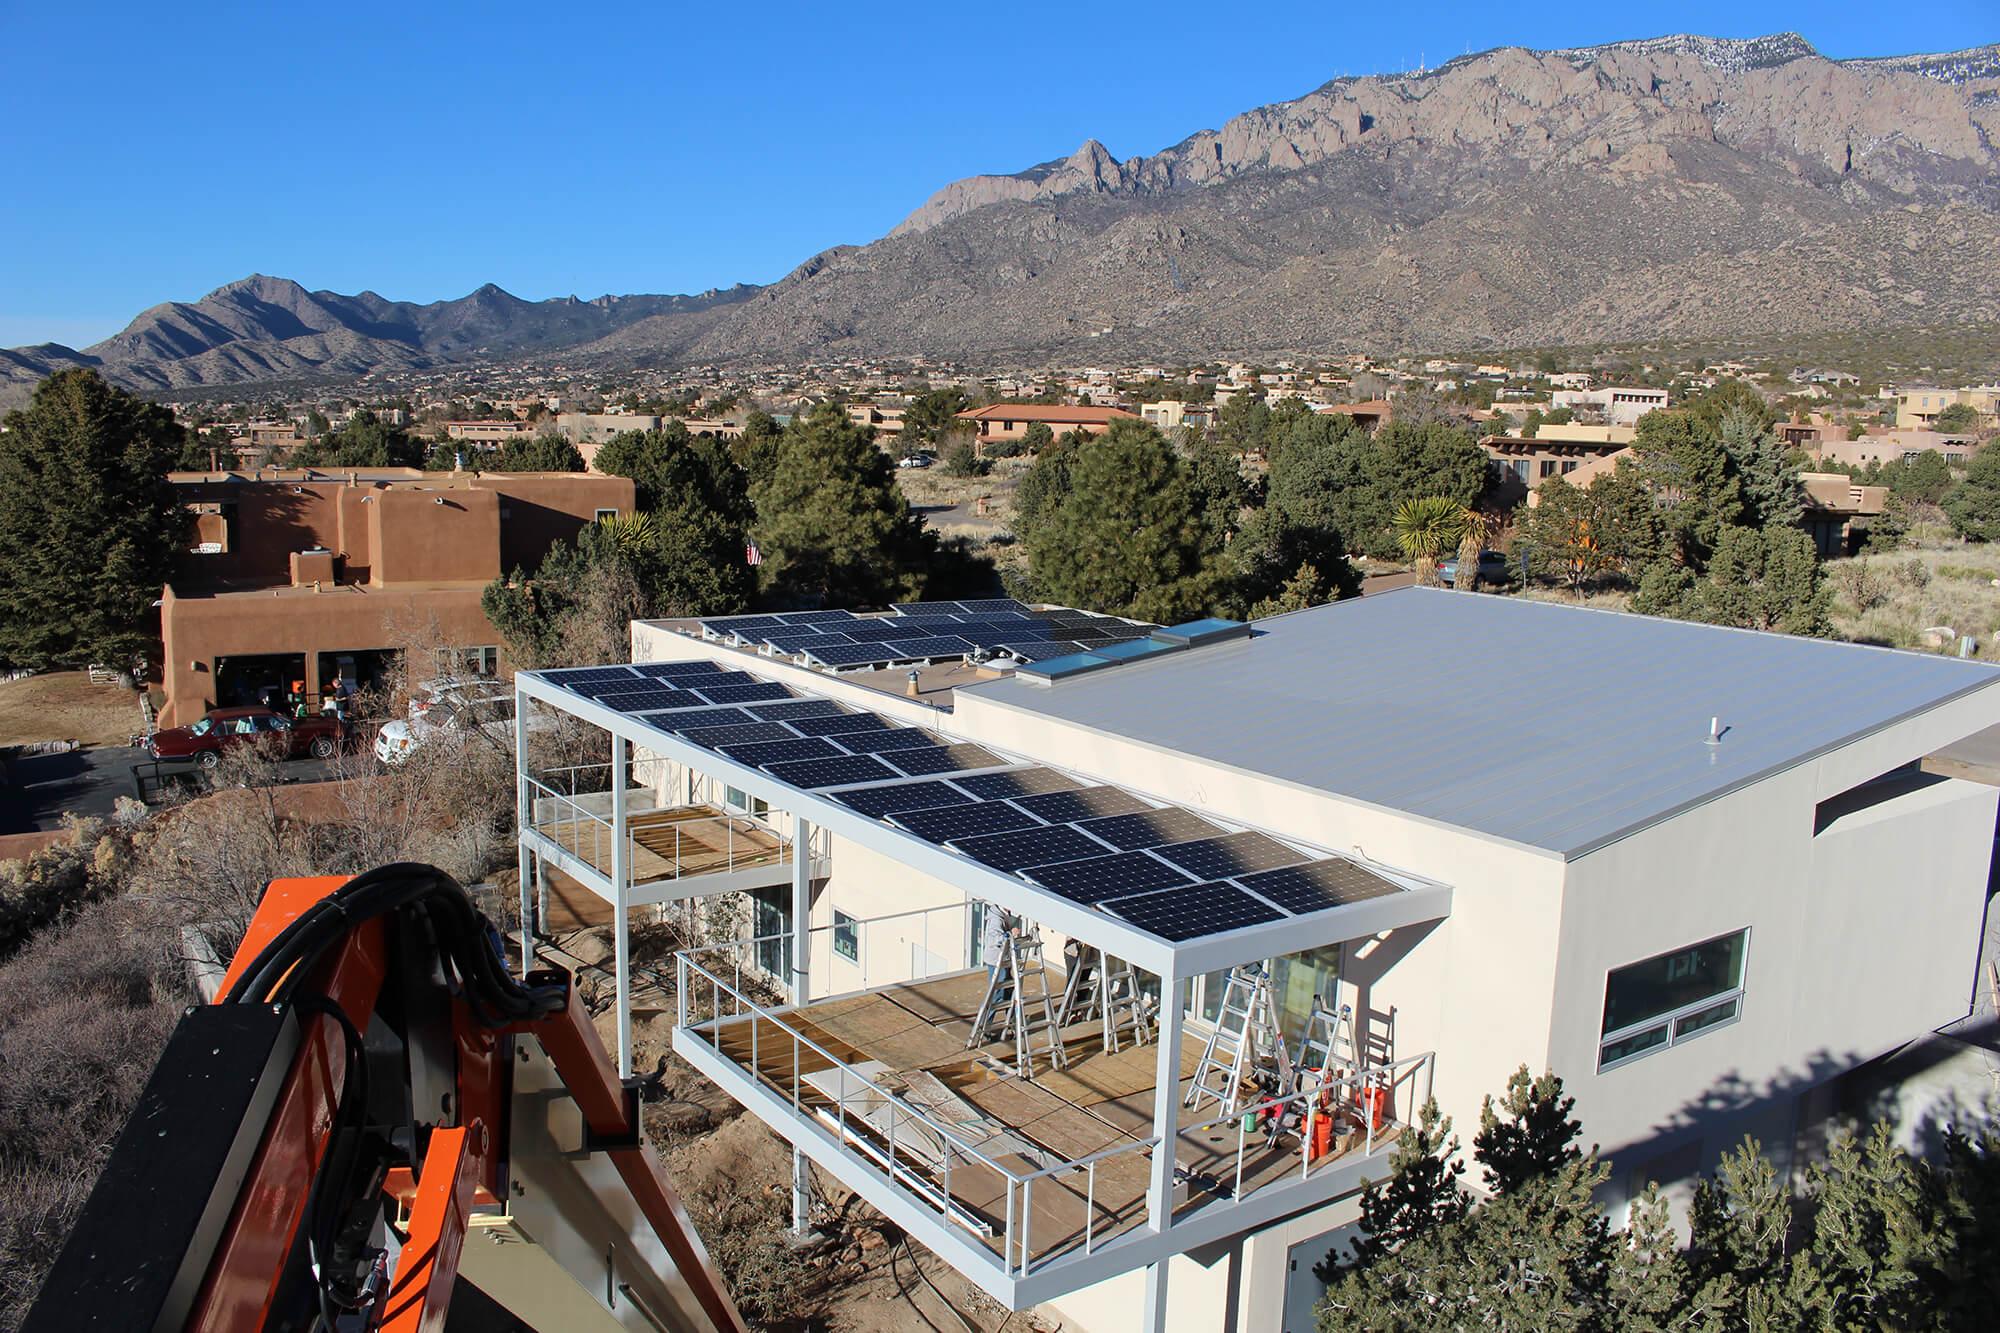 13.4kw Solar PV system